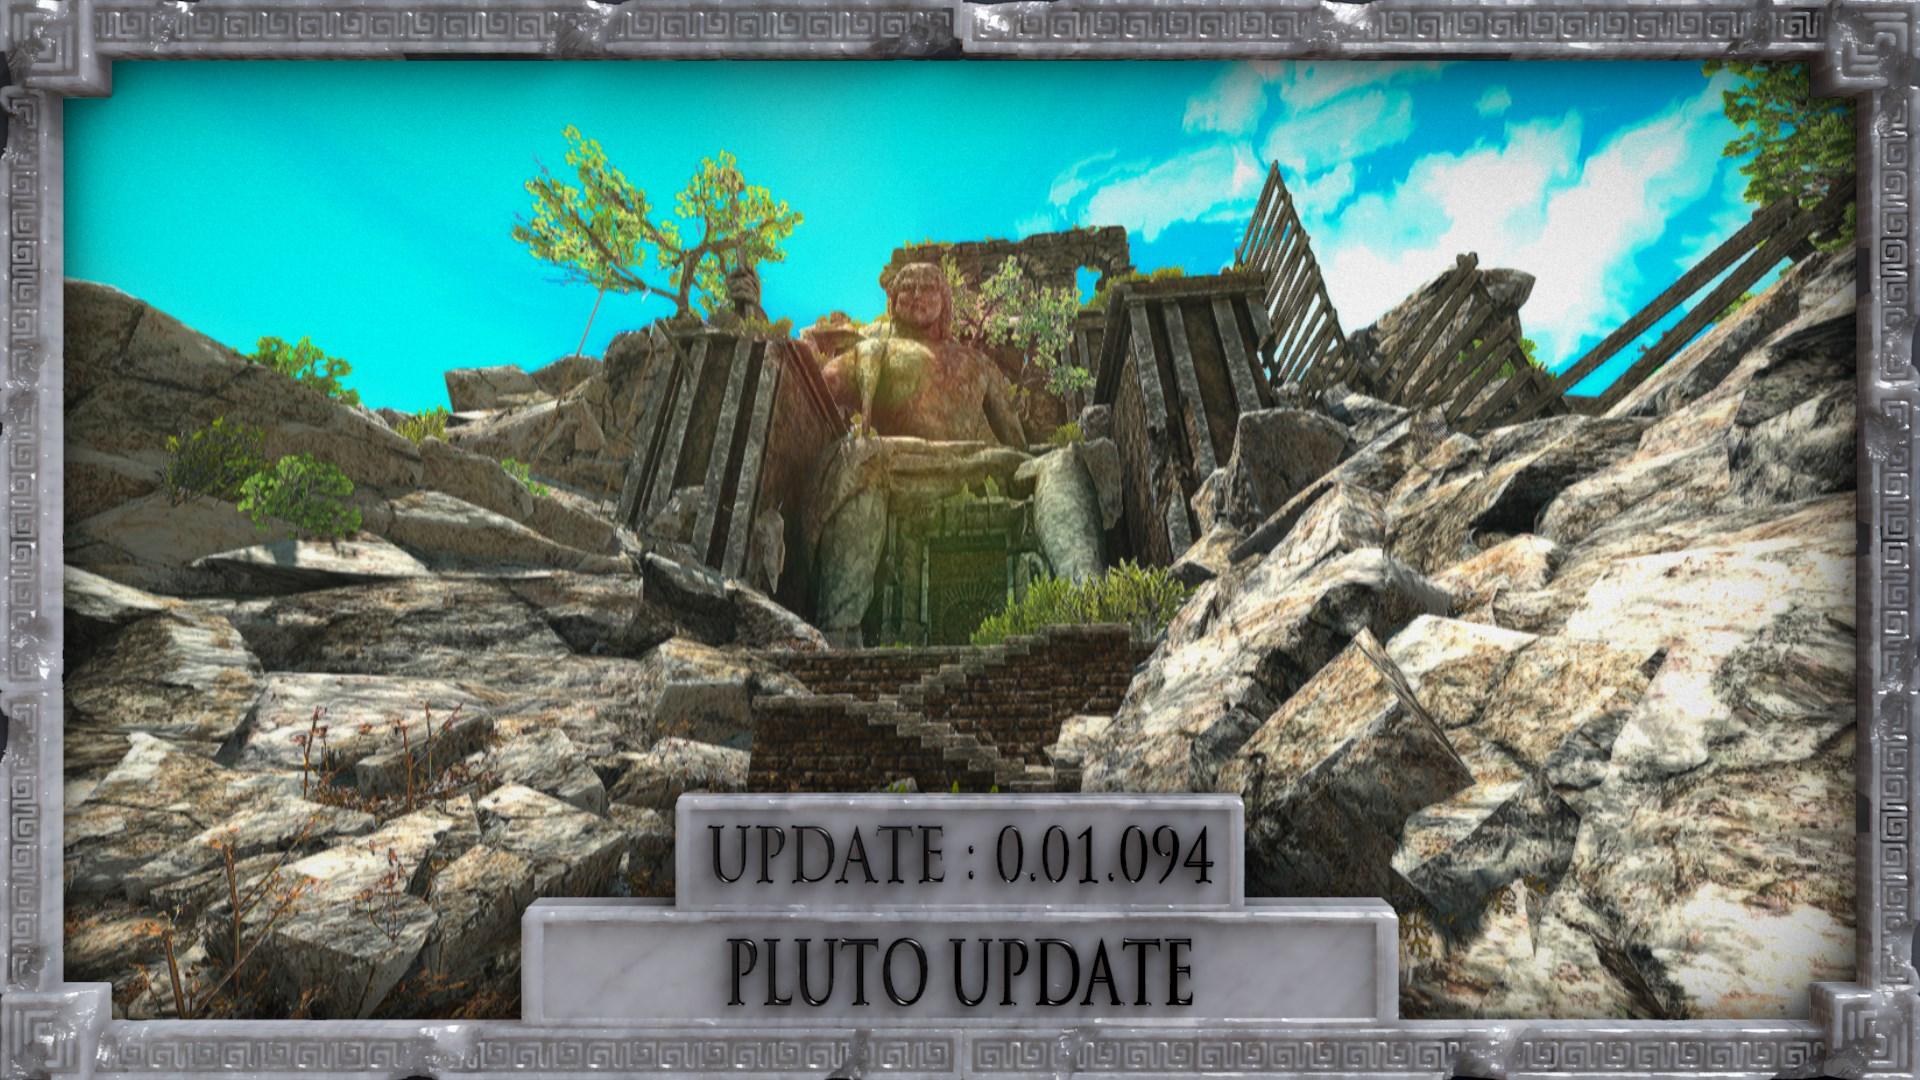 pluto update